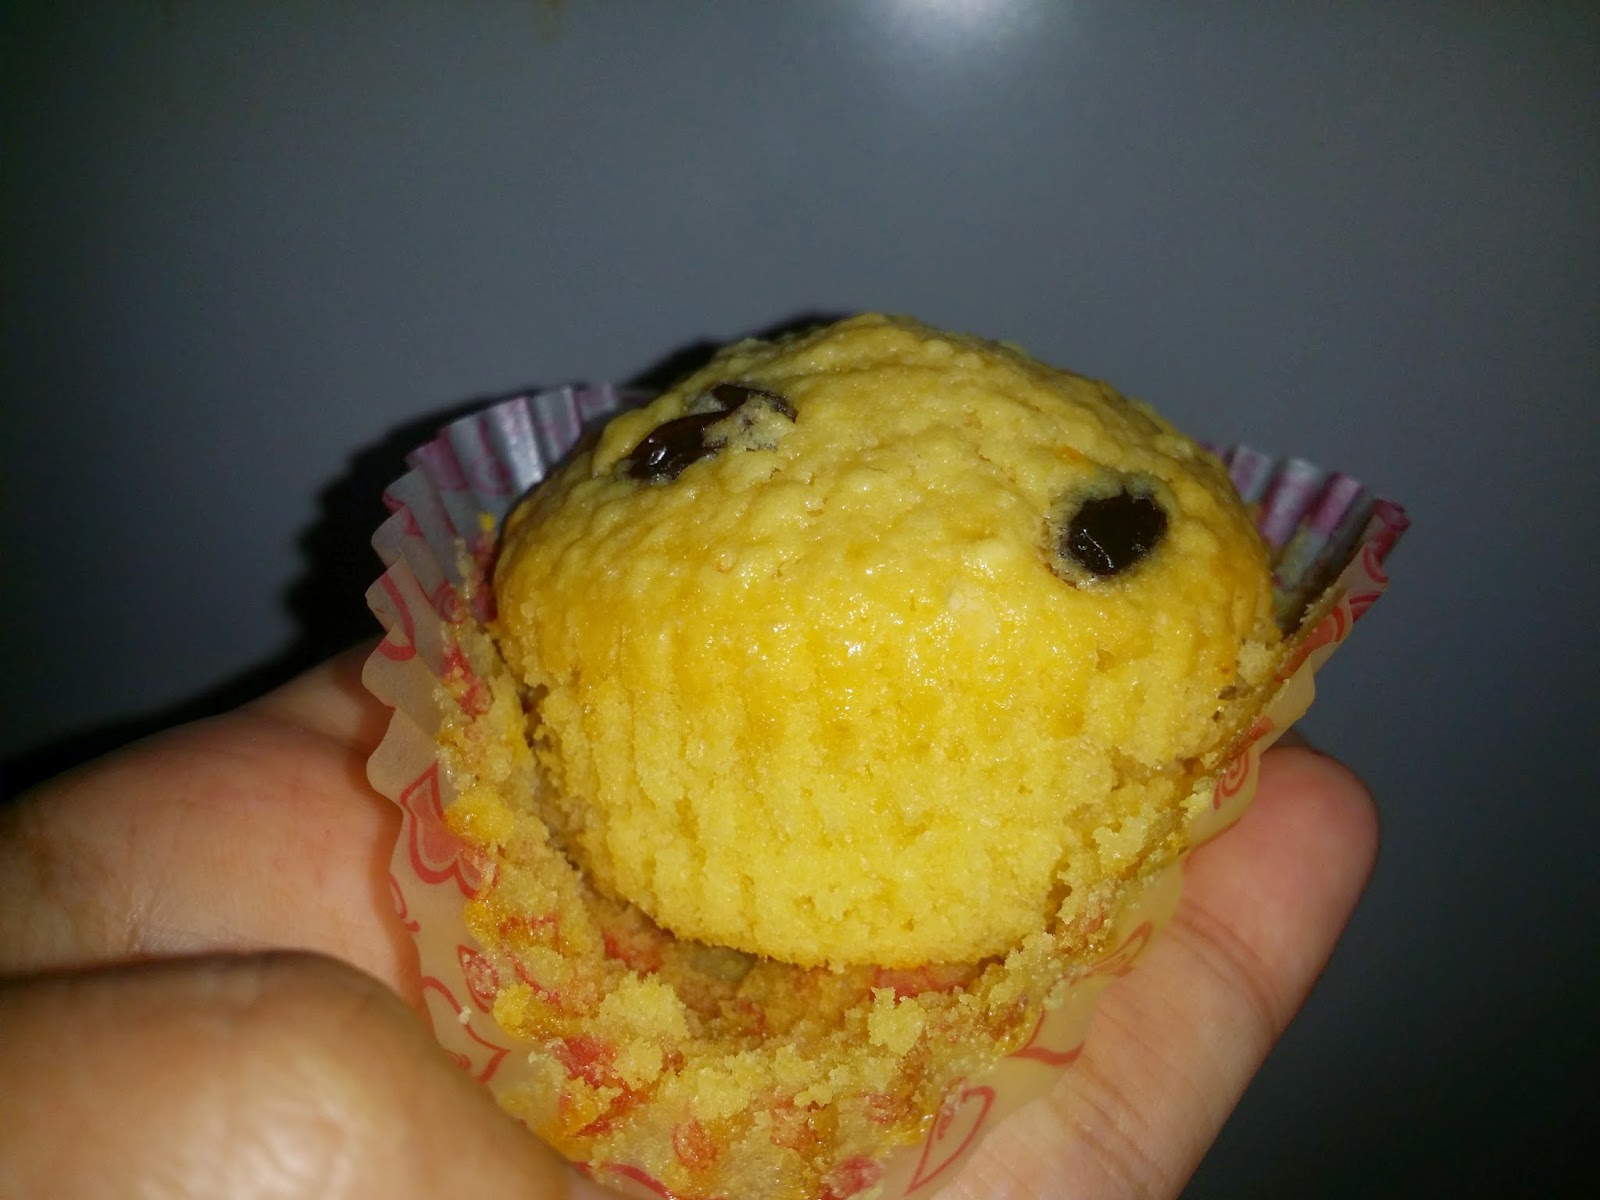 cara buat muffin, cara nak buat muffin gebu, muffin kismis, muffin sedap, muffin tanpa mixer, muffin vanilla, resepi muffin paling senang,